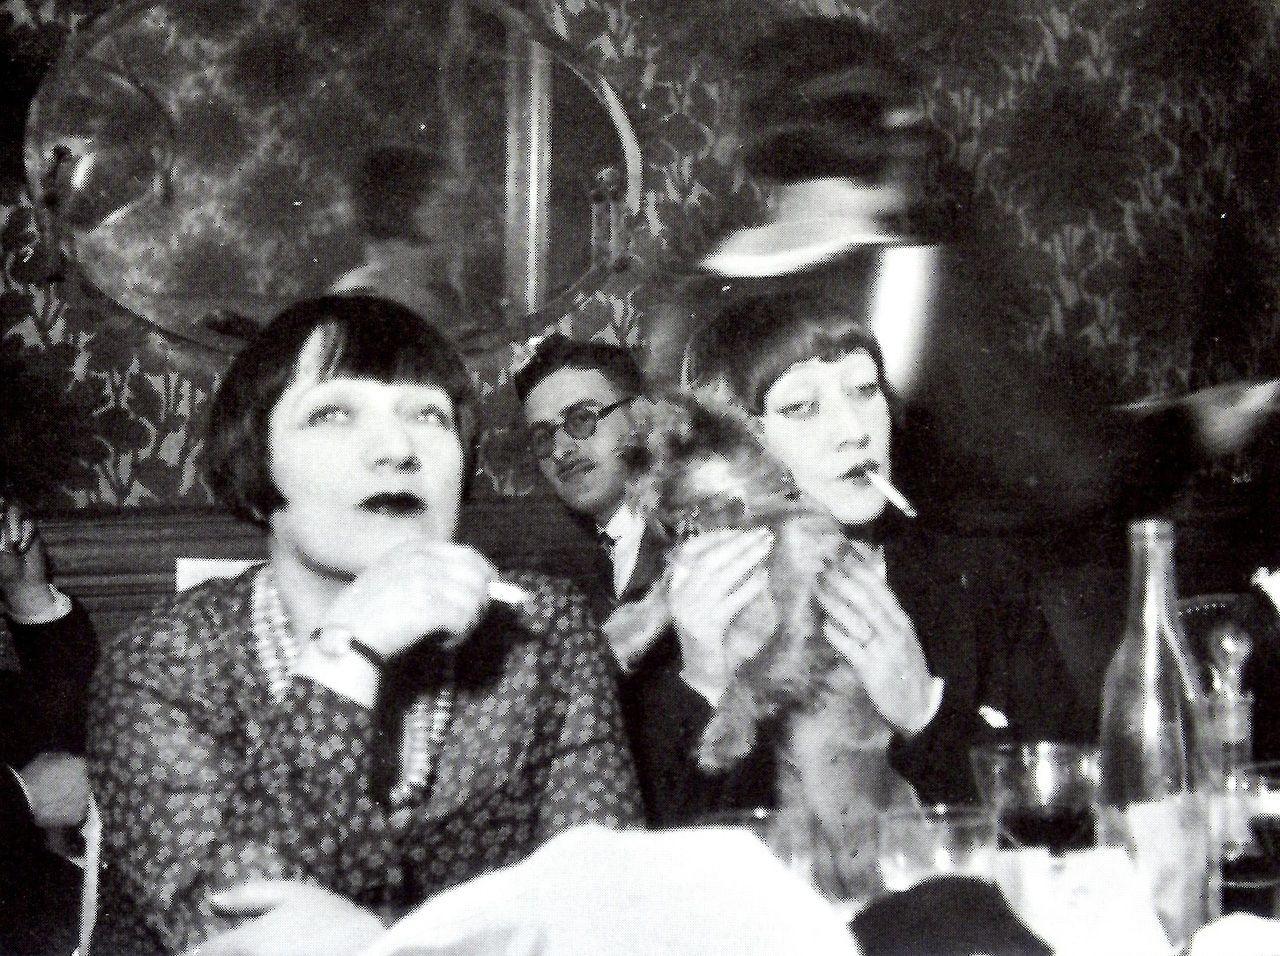 Man Ray Modigliani: Kiki De Montparnasse Et Hermine David, Paris, Années 1920